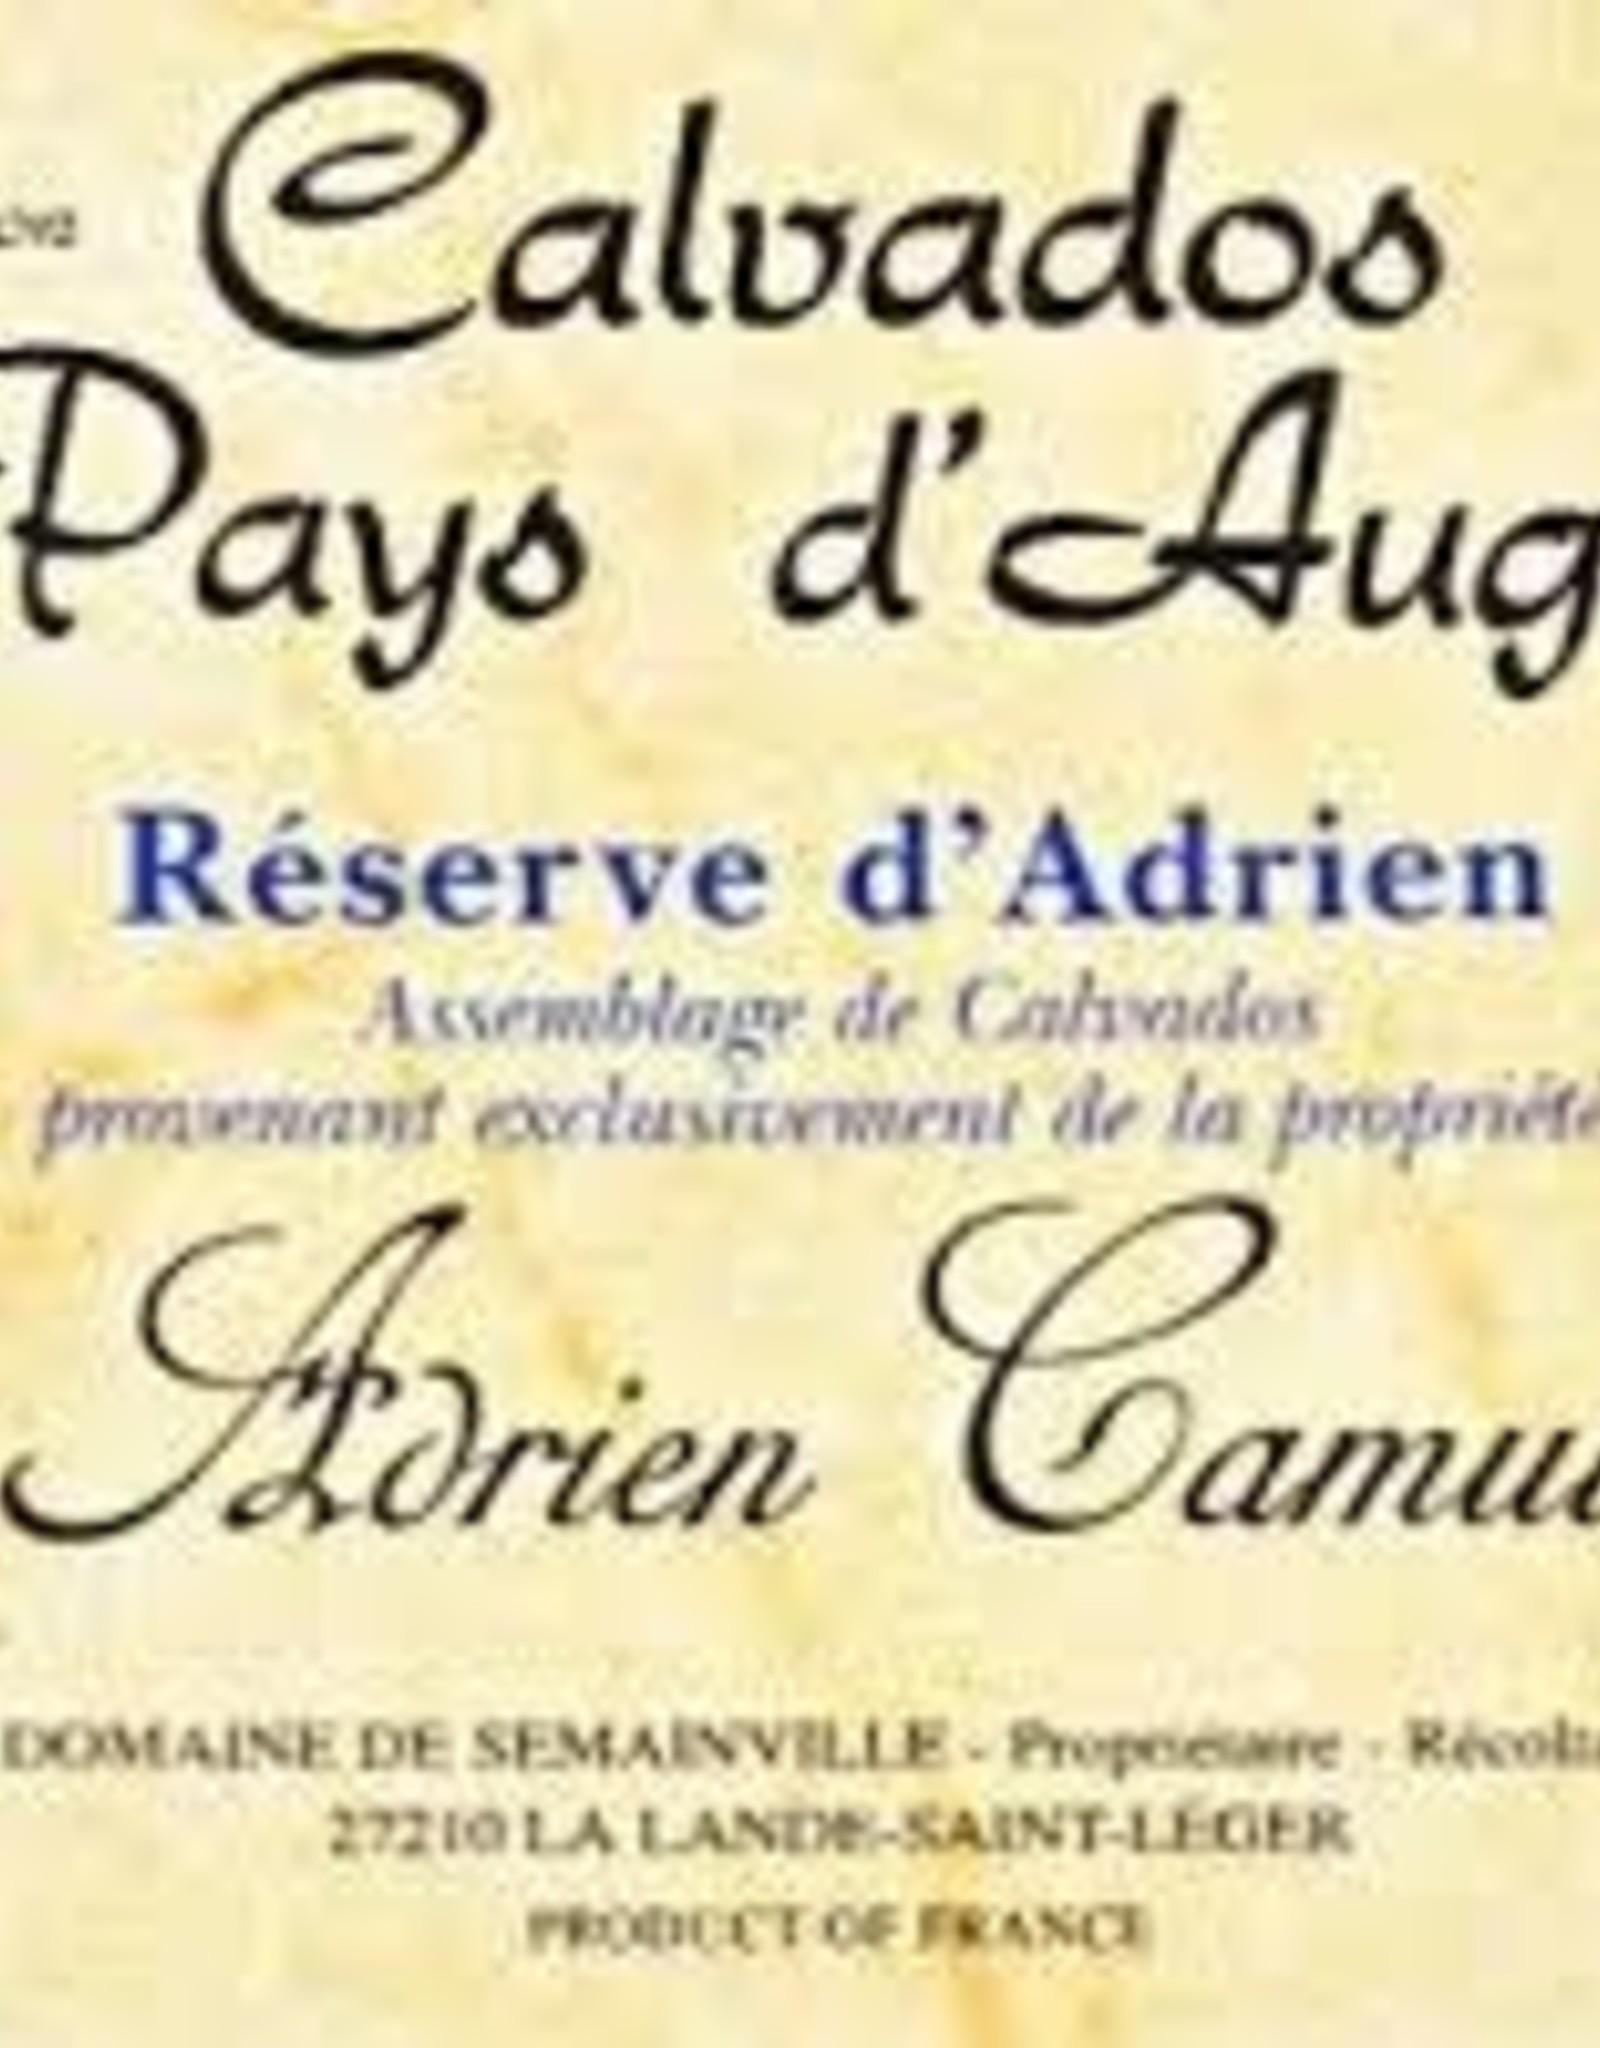 Spirits Calvados, Pays d'Auge, '35yr Old - Reserve d'Adrien', Calvados Adrien Camut